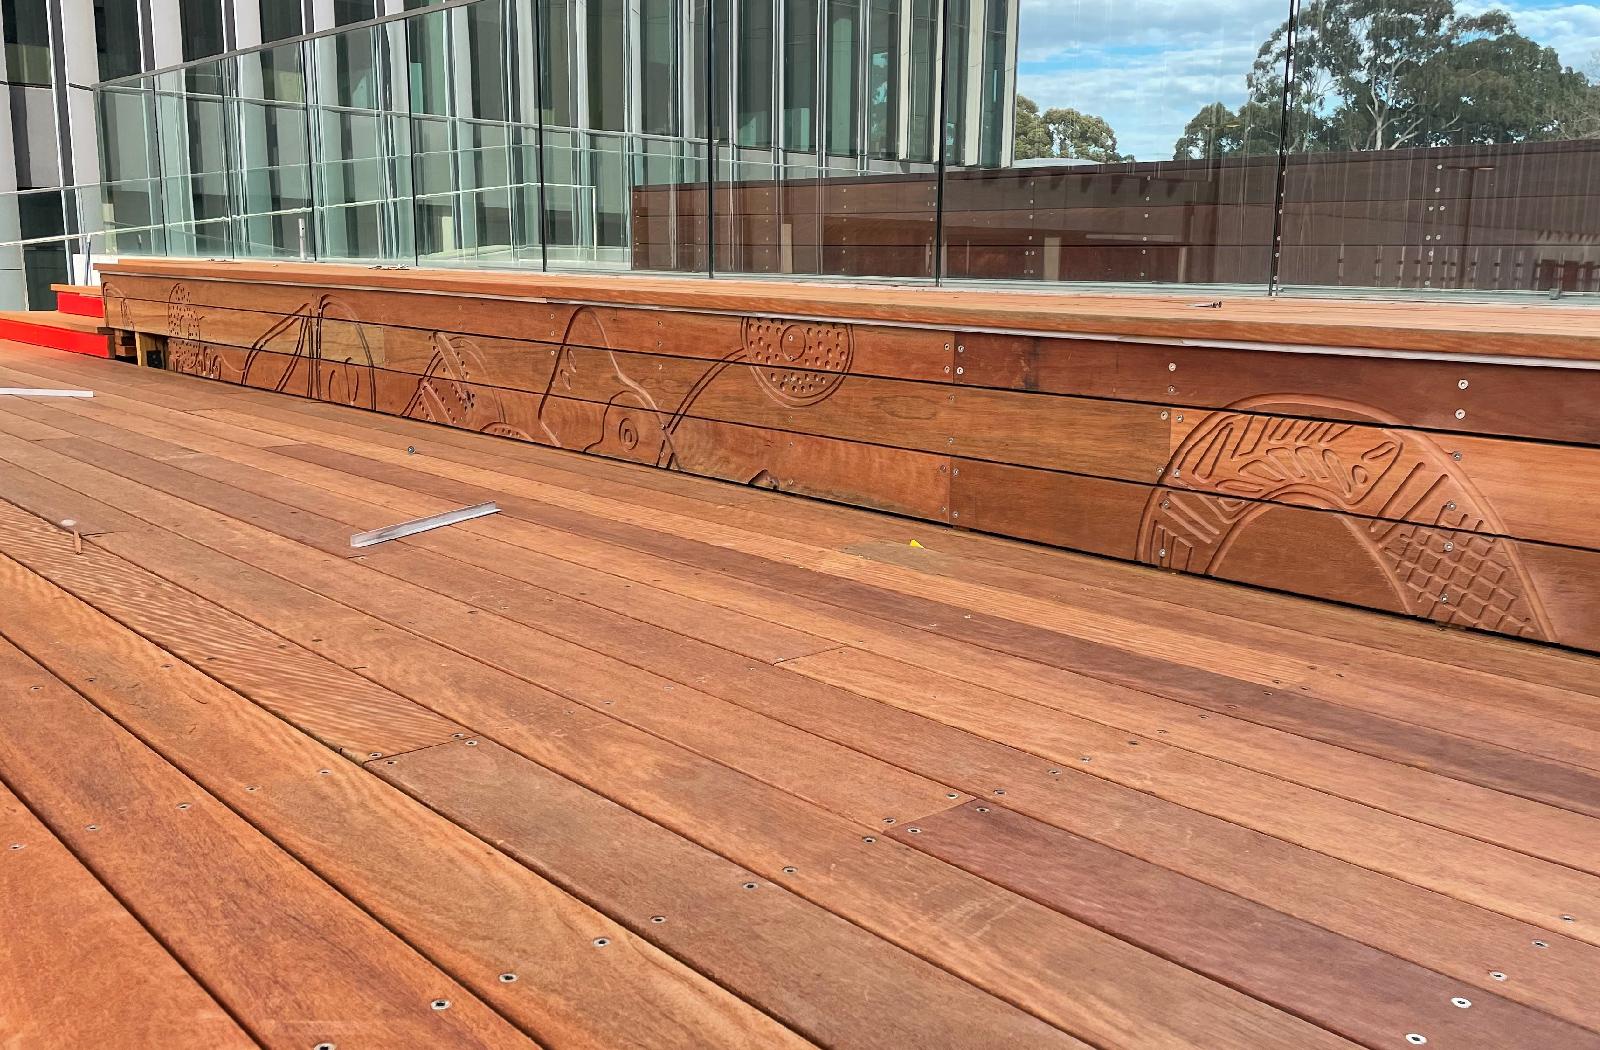 Alumni Park Tribune in construction by McGregor Westlake Architecture